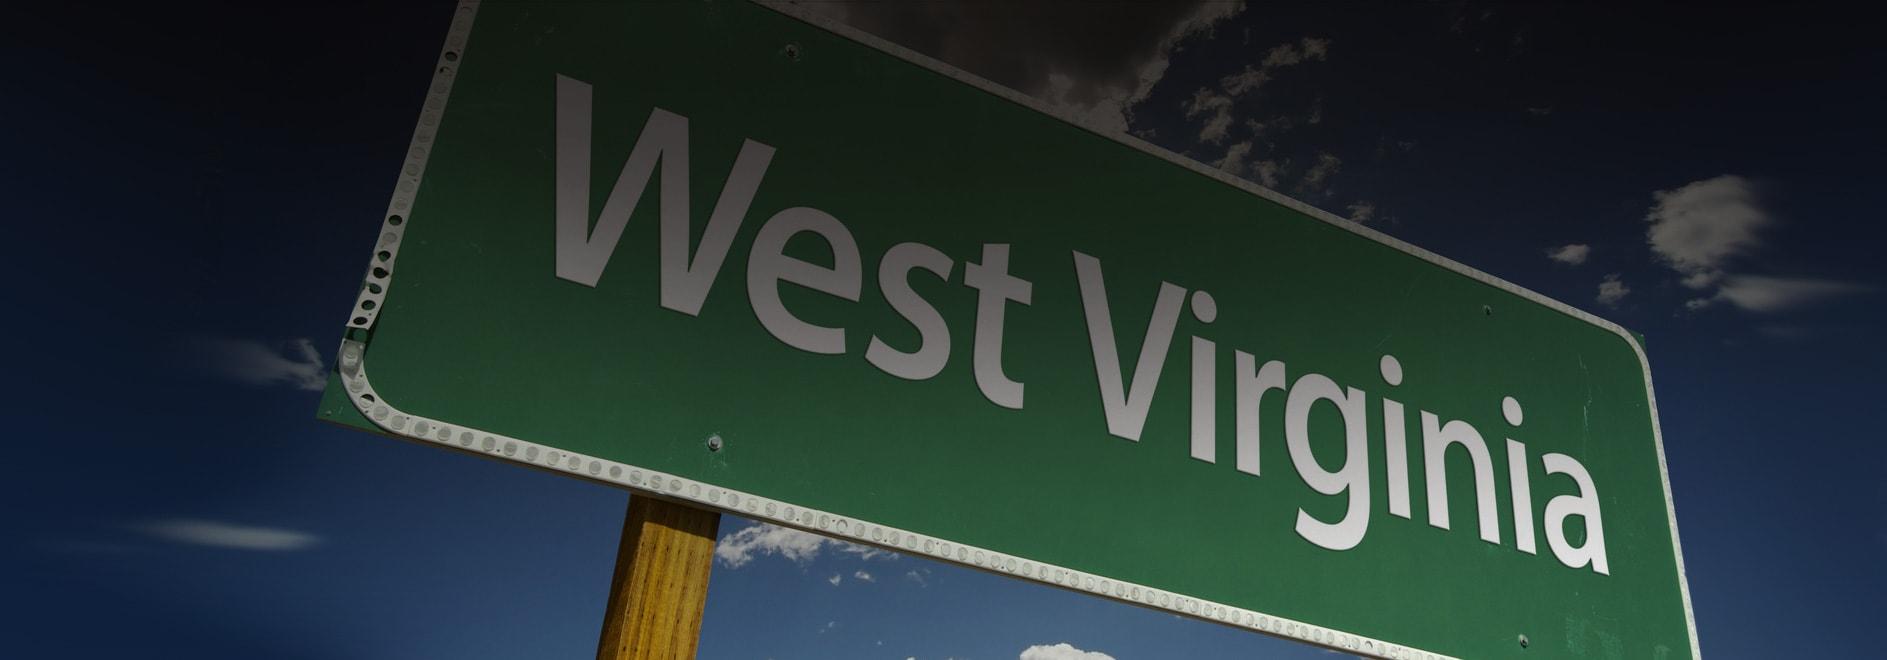 Web Design Wheeling West Virginia